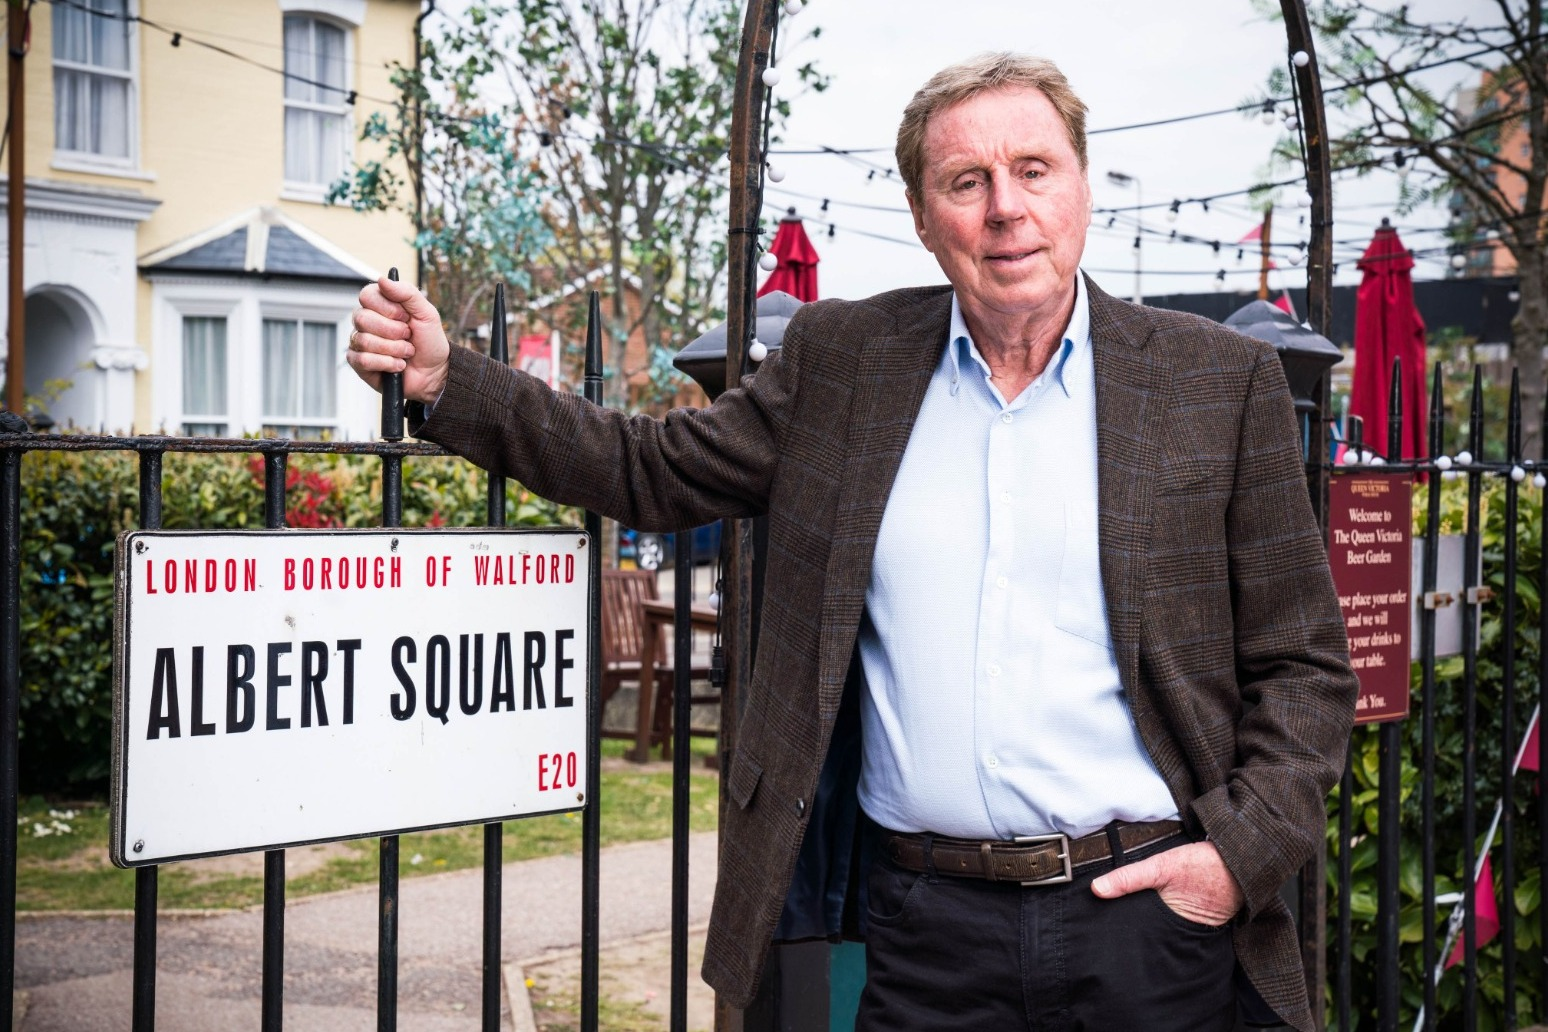 Harry Redknapp to make EastEnders cameo